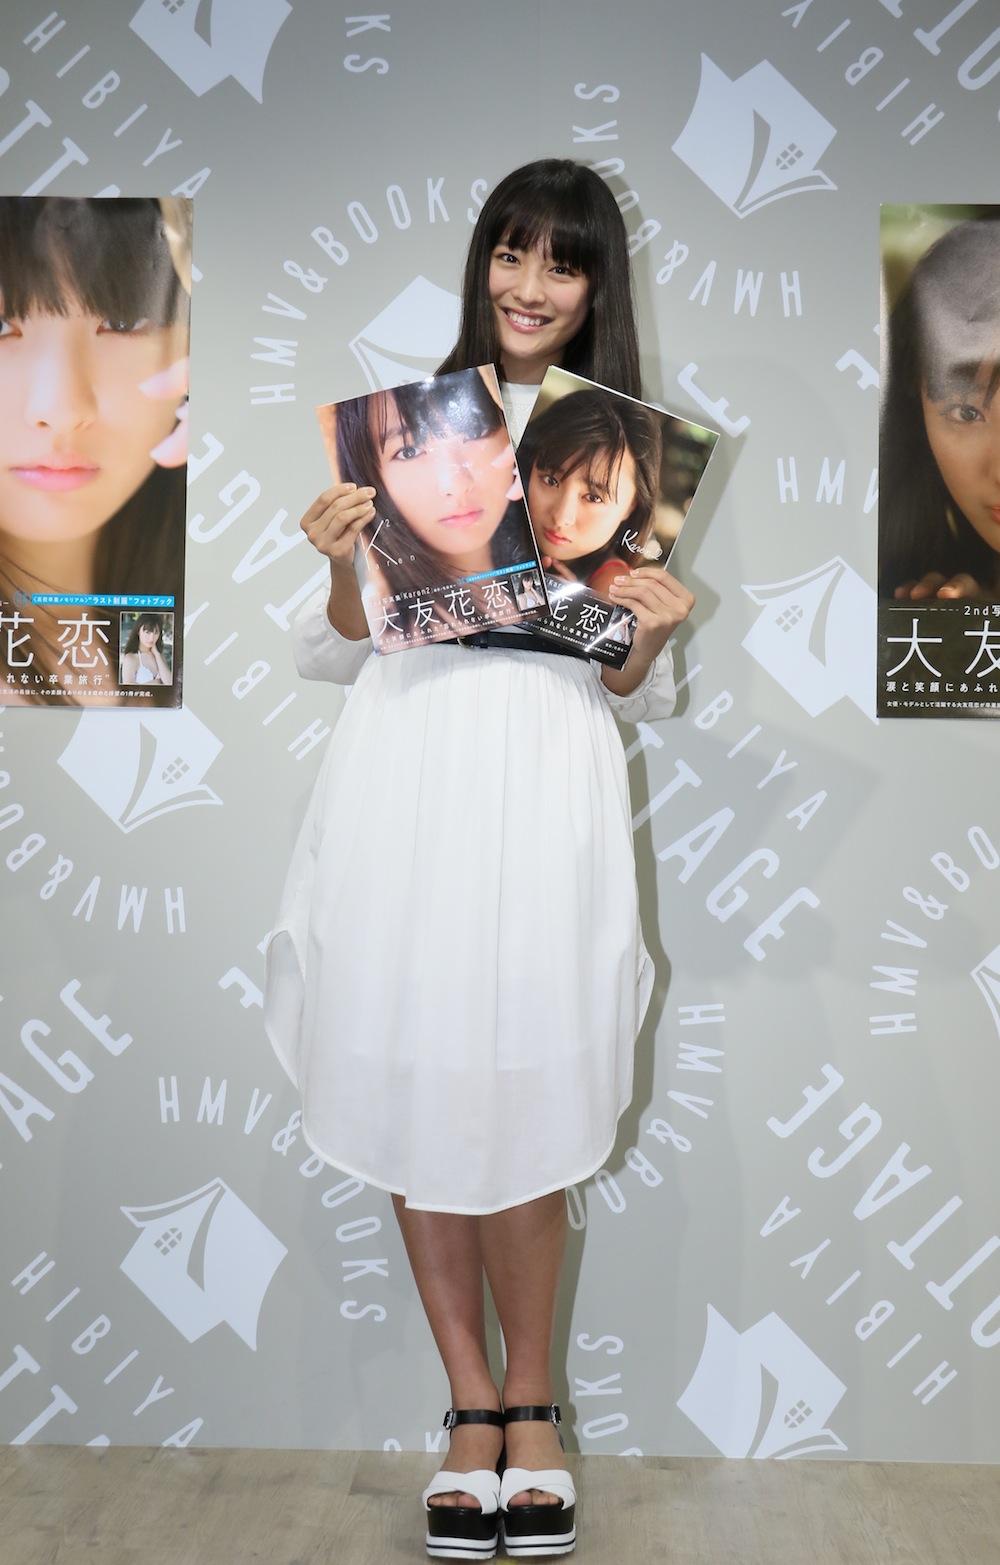 大友花恋、2nd写真集「Karen2」発売記念イベント